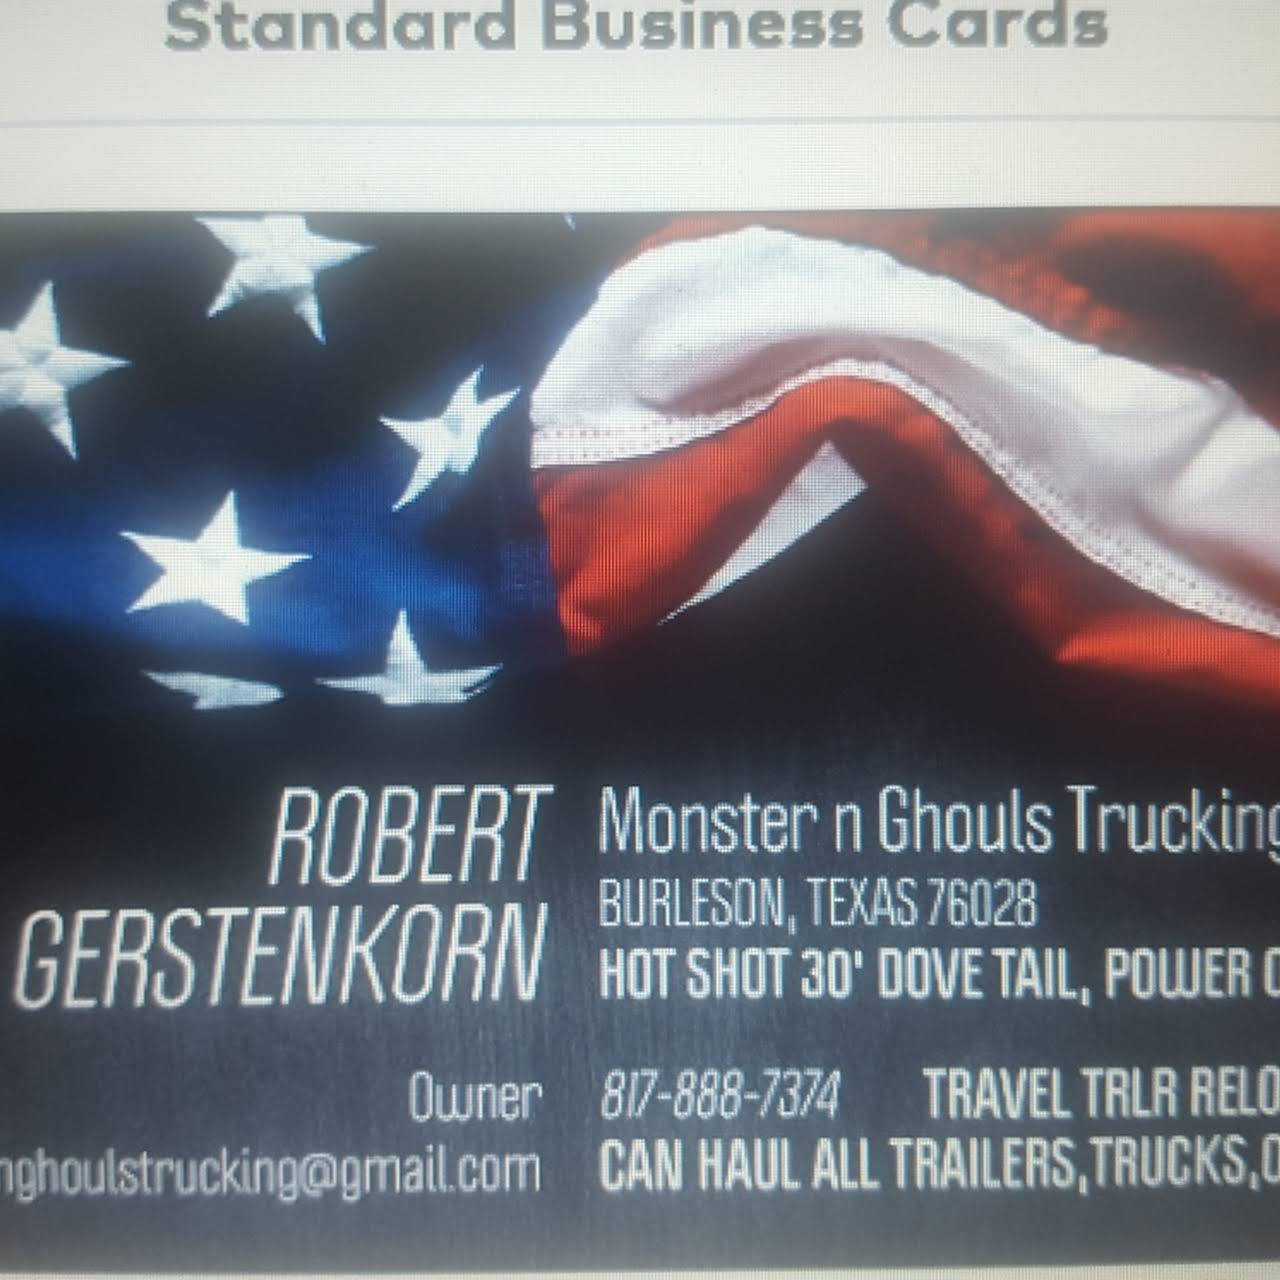 Hot Shot Business Cards